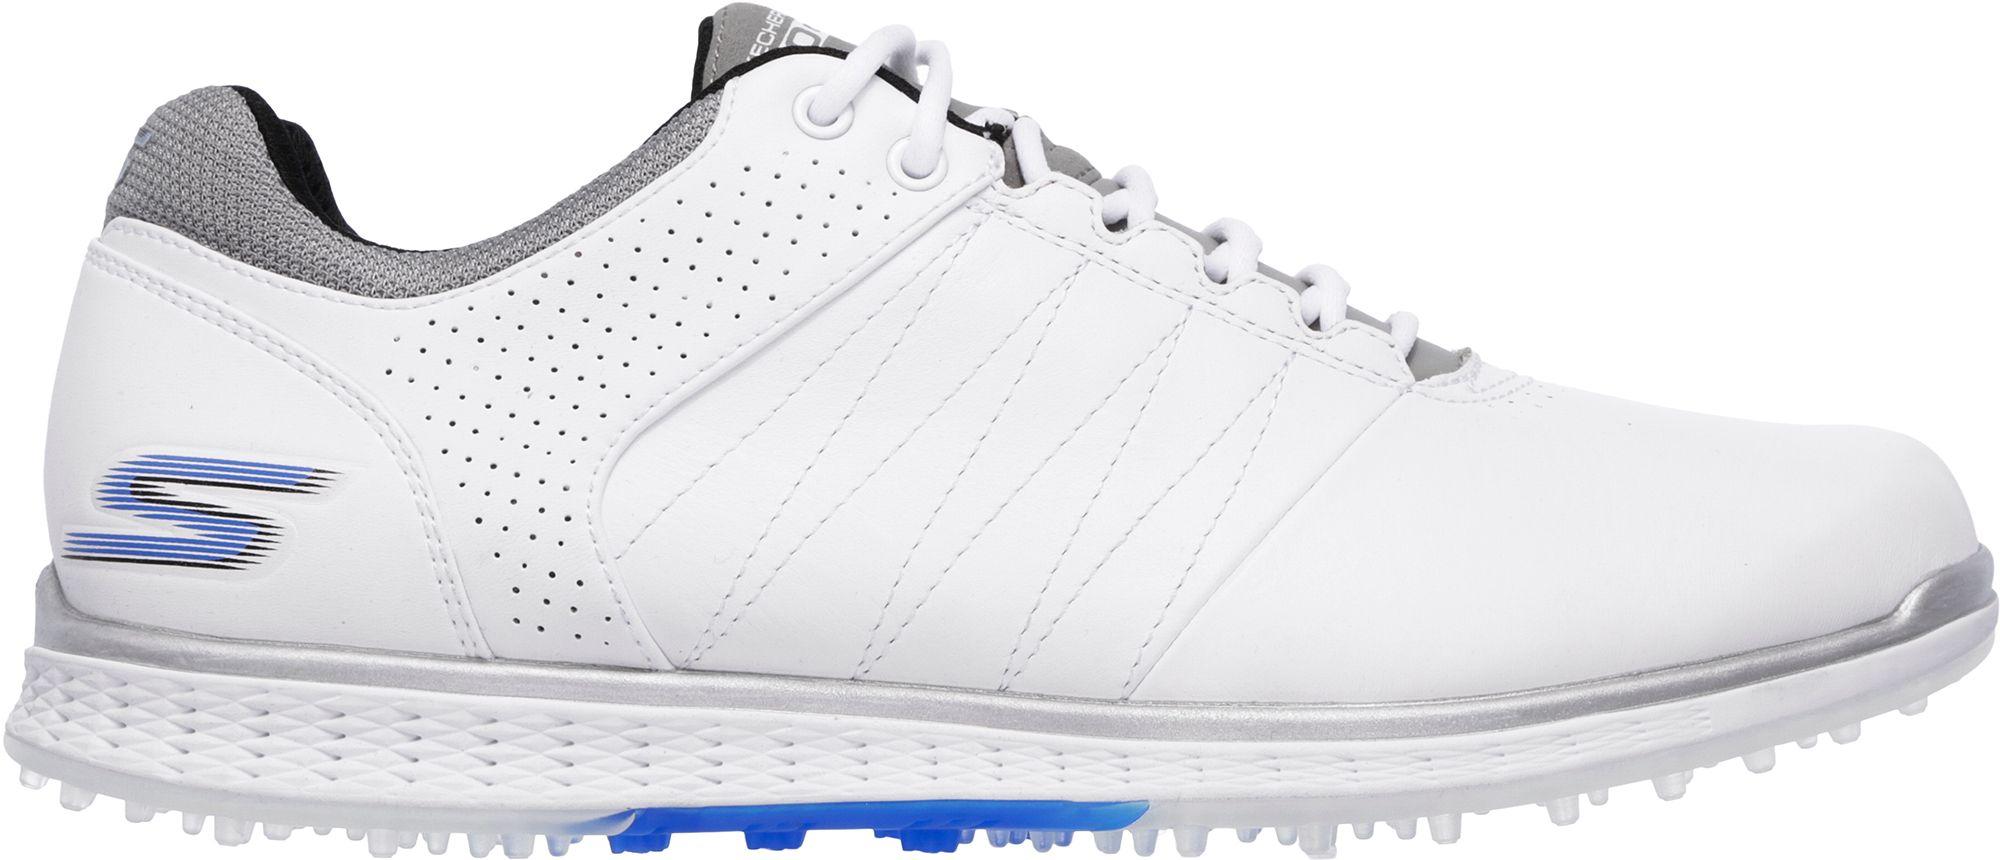 Skechers GO GOLF Elite 2 Golf Shoes